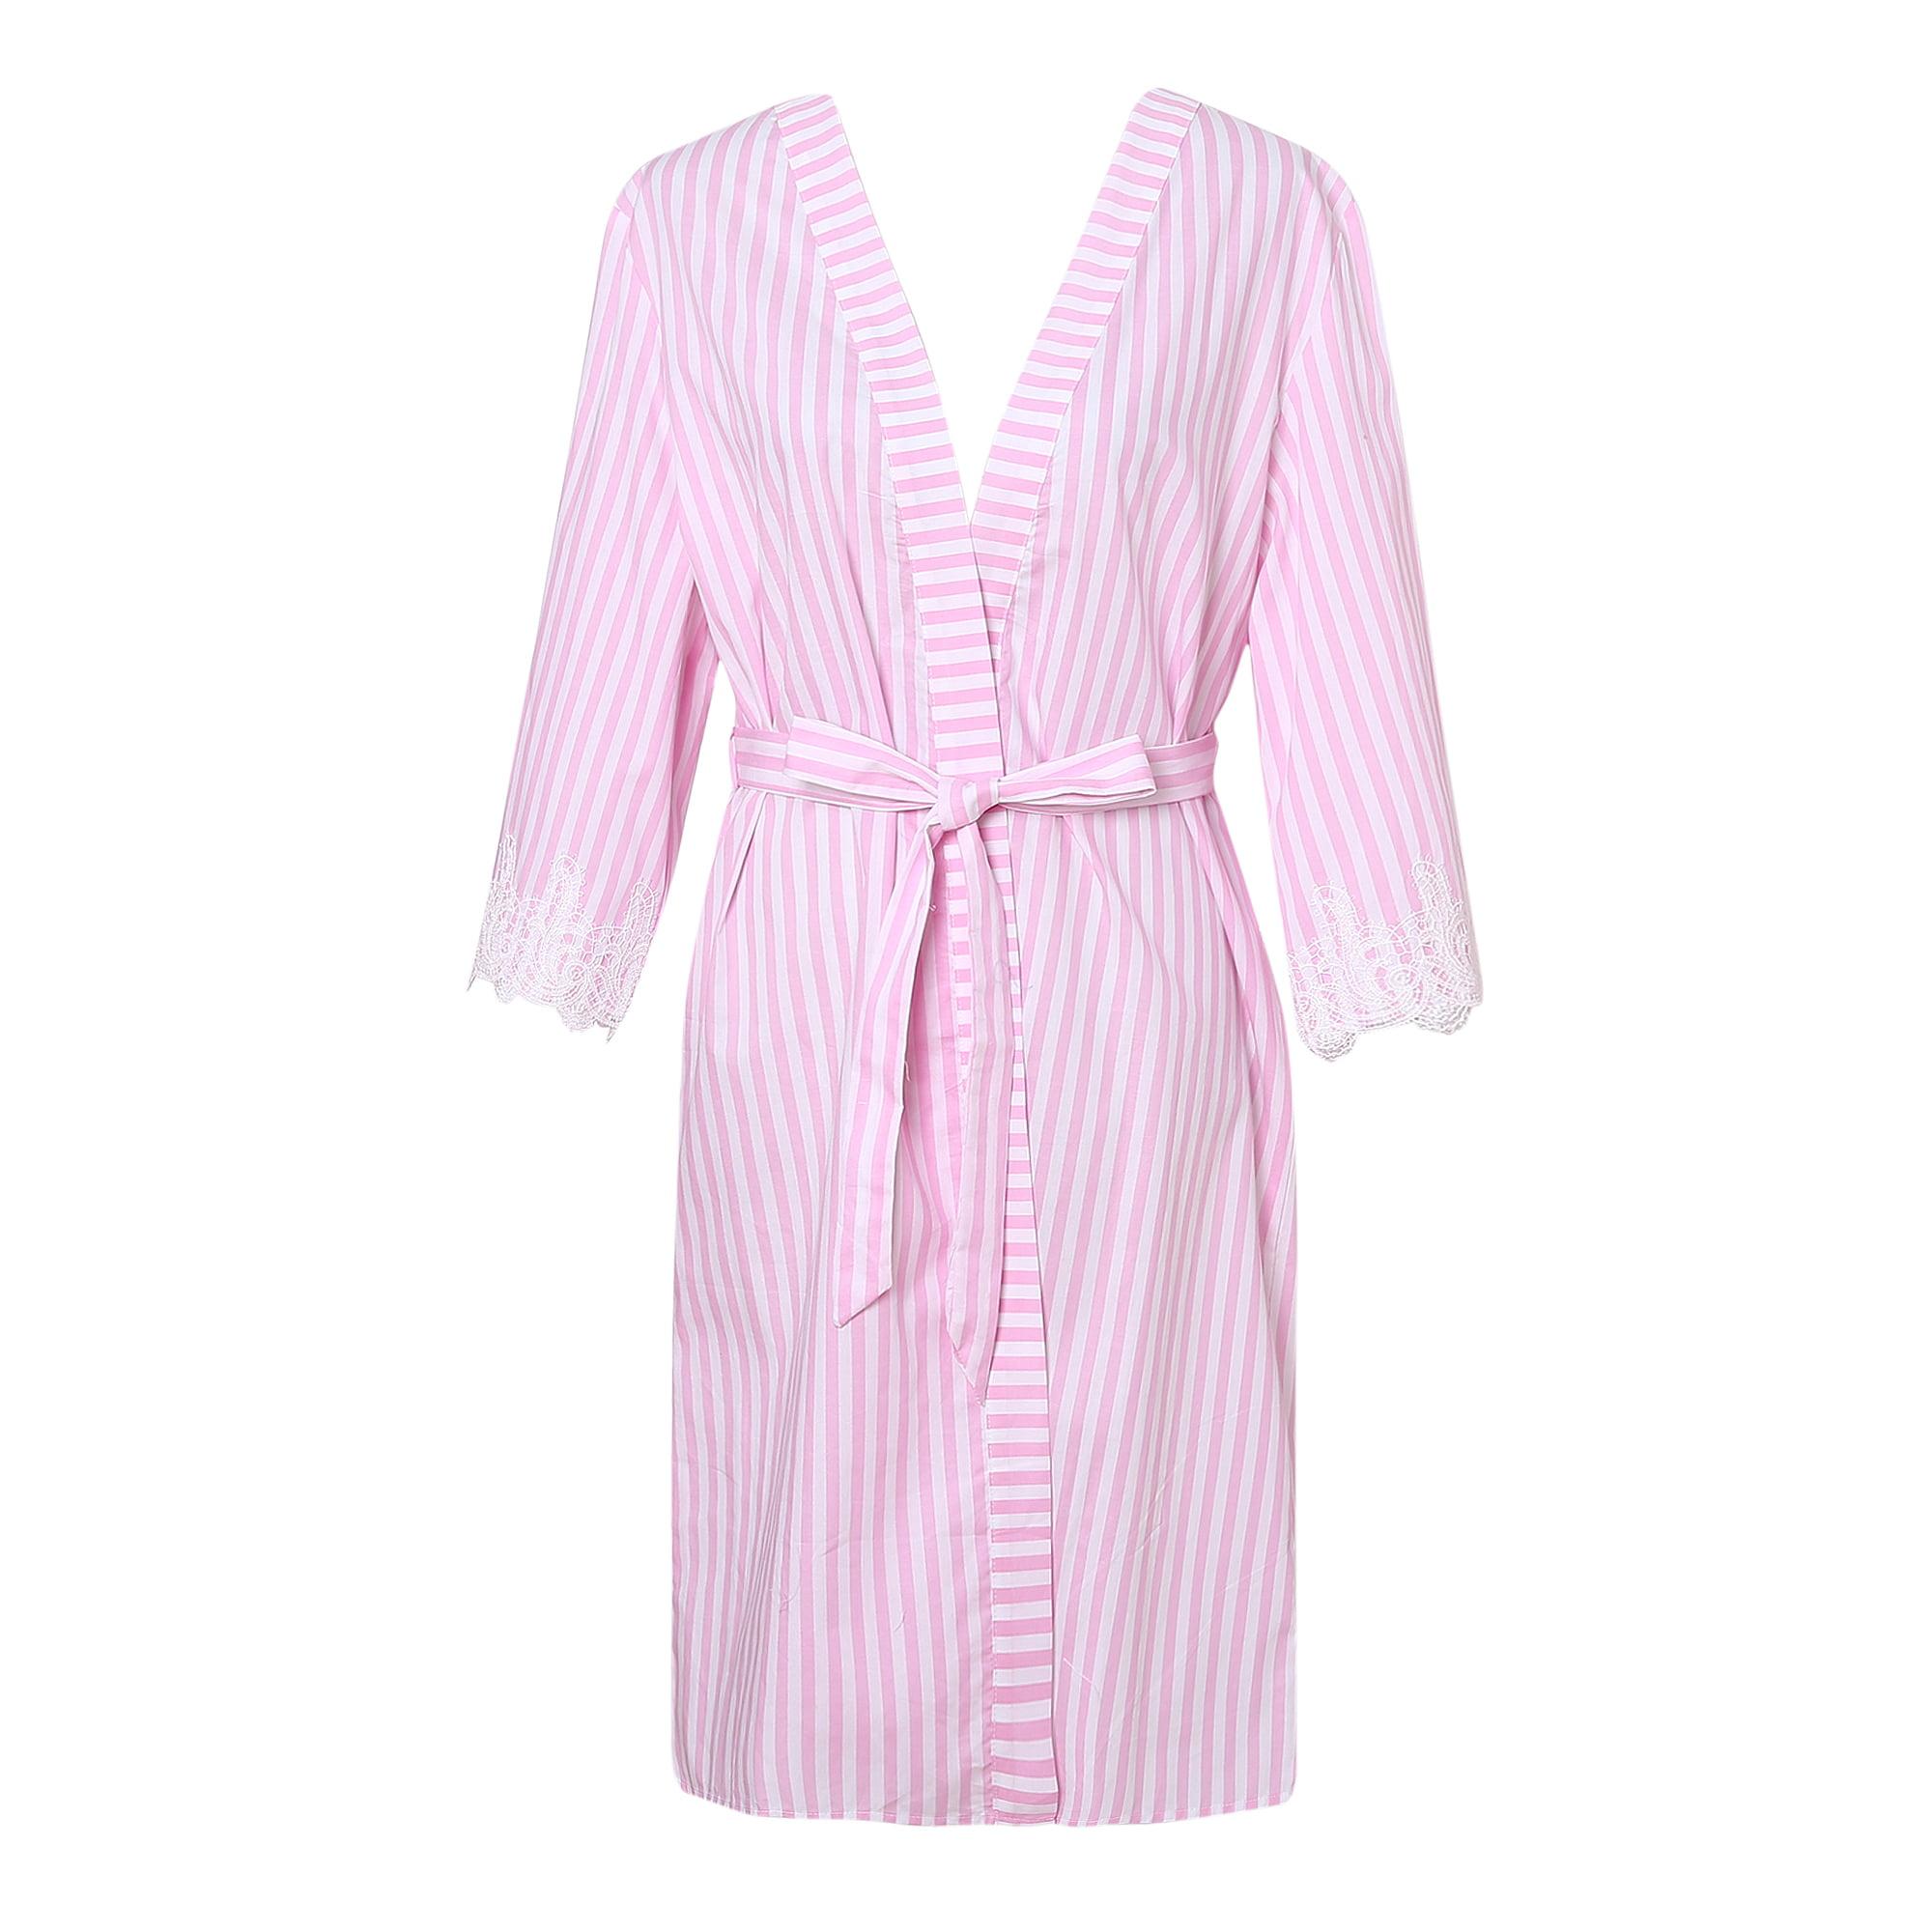 Richie House Women's Summer Striped Hiyoku Pajama Sleepwe...